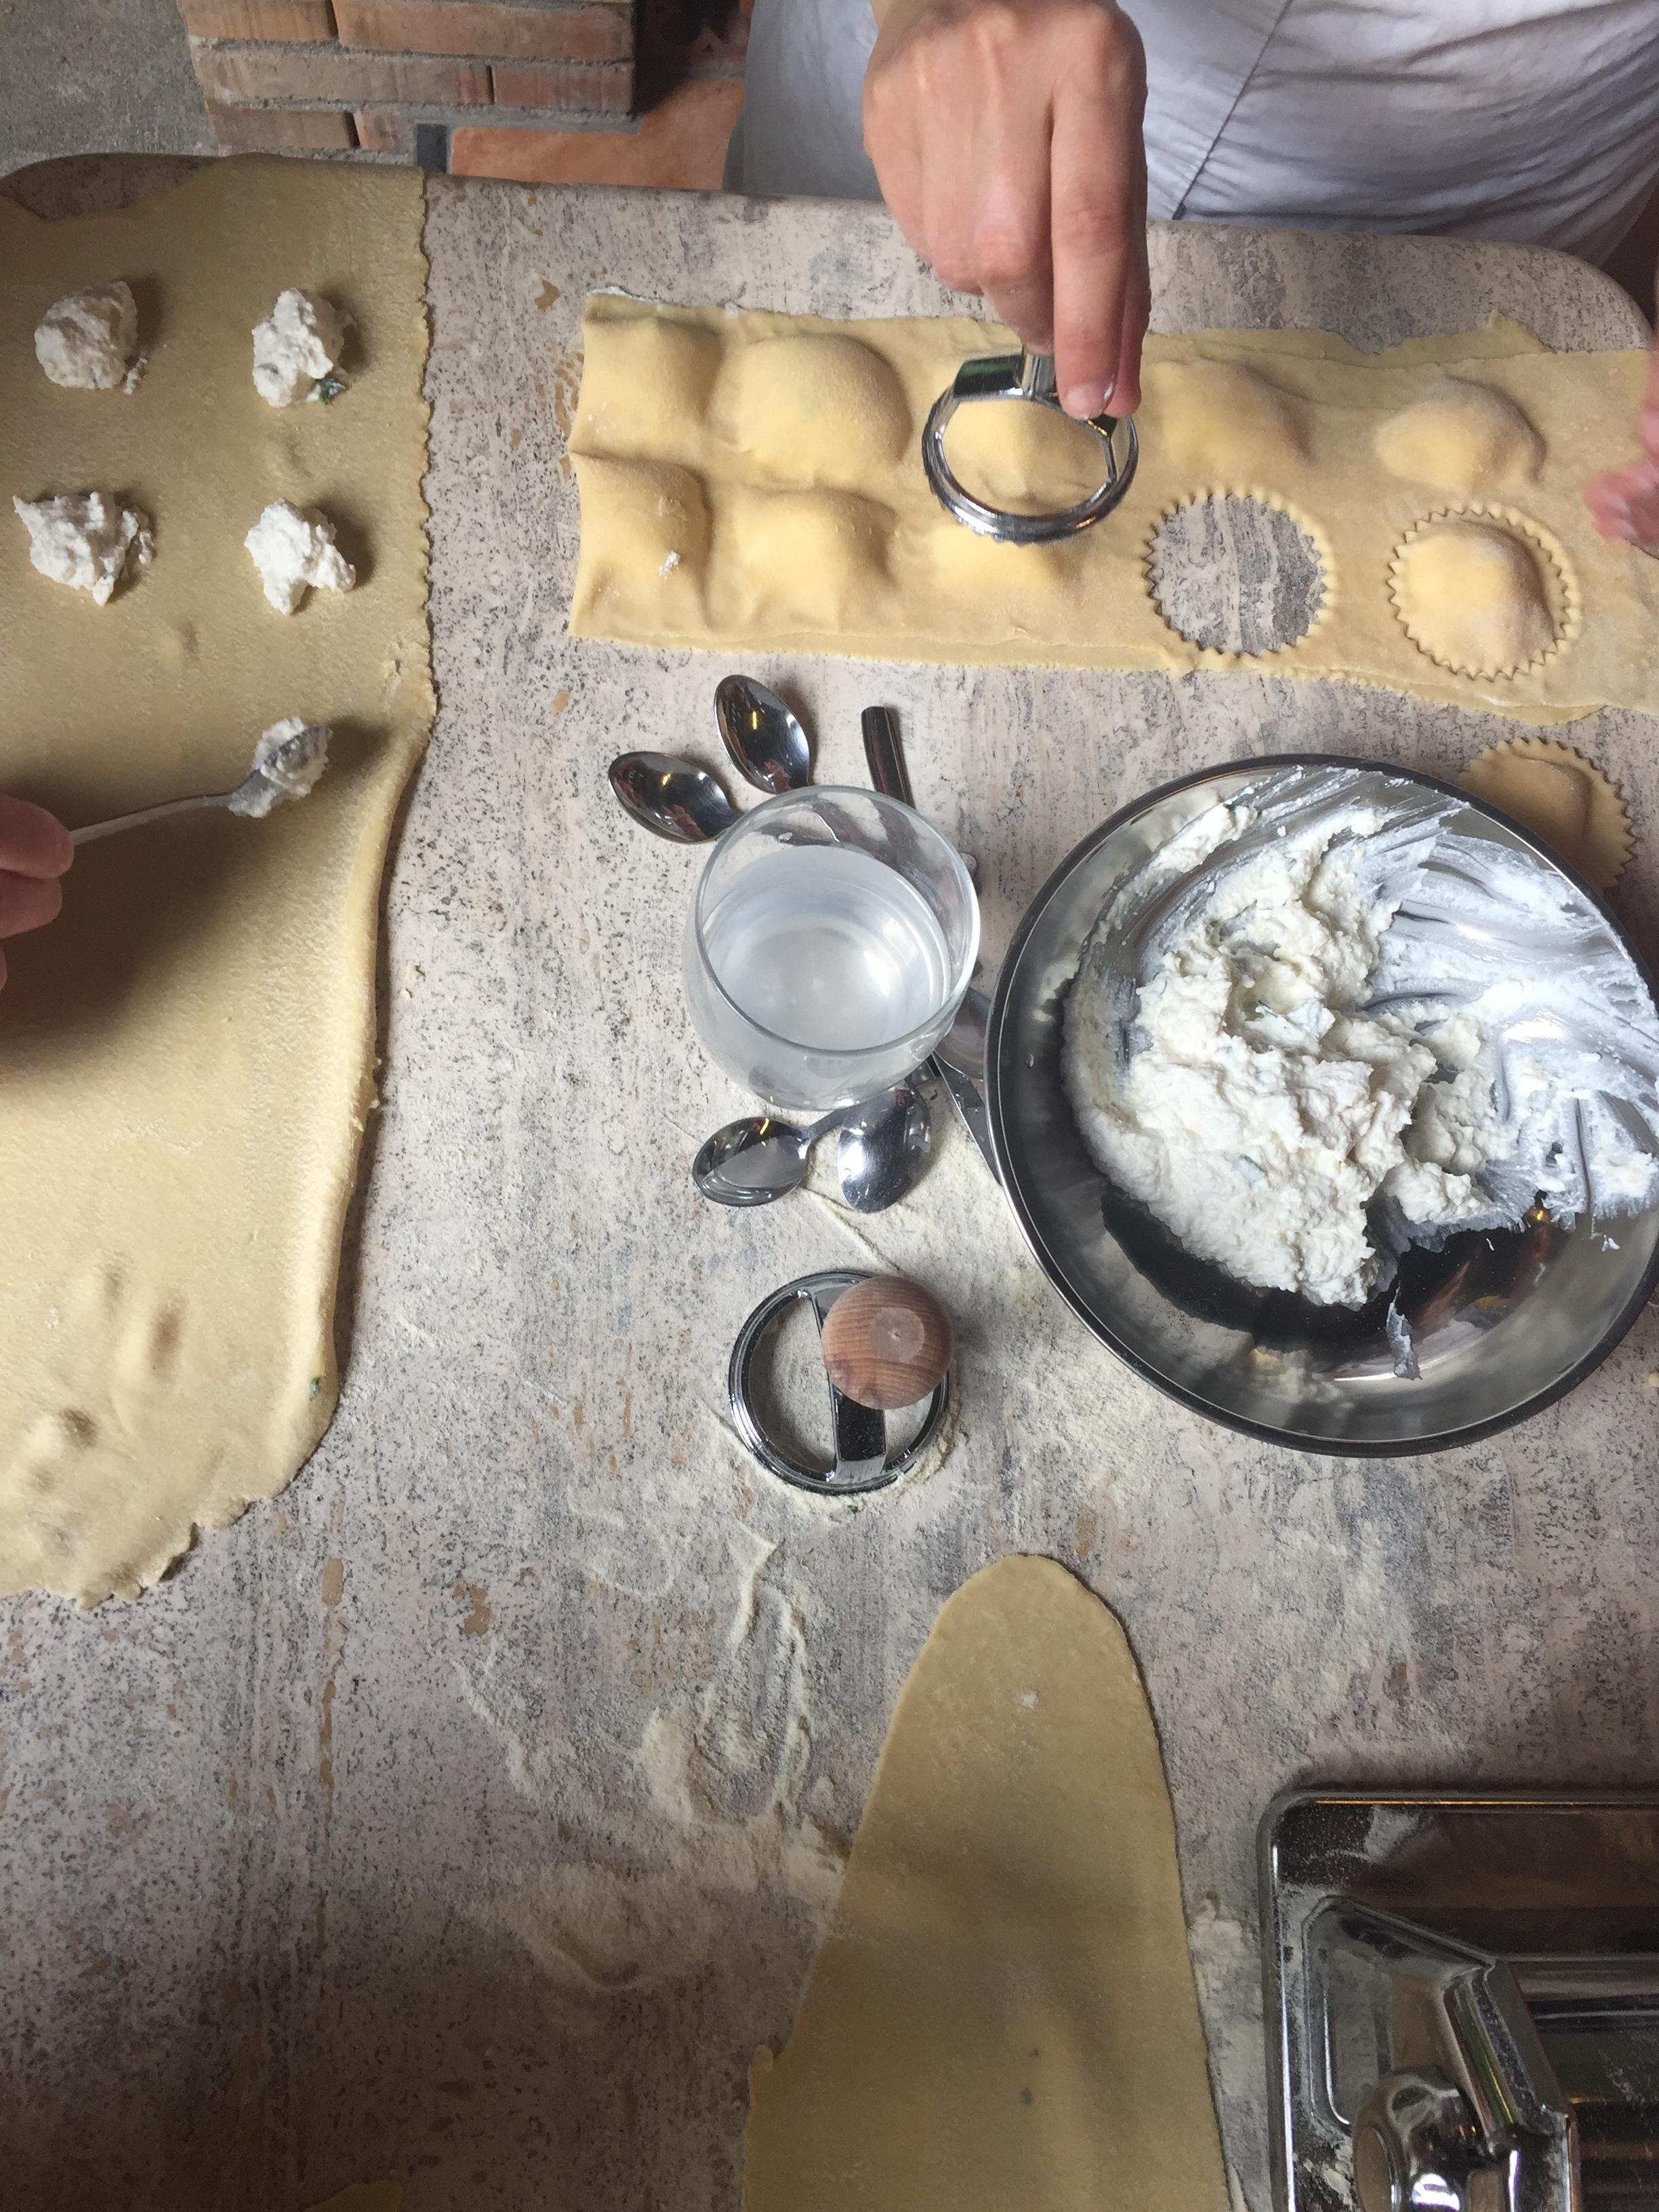 Making ravioli EAT.PRAY.MOVE Yoga Retreats | Amalfi Coast, Italy